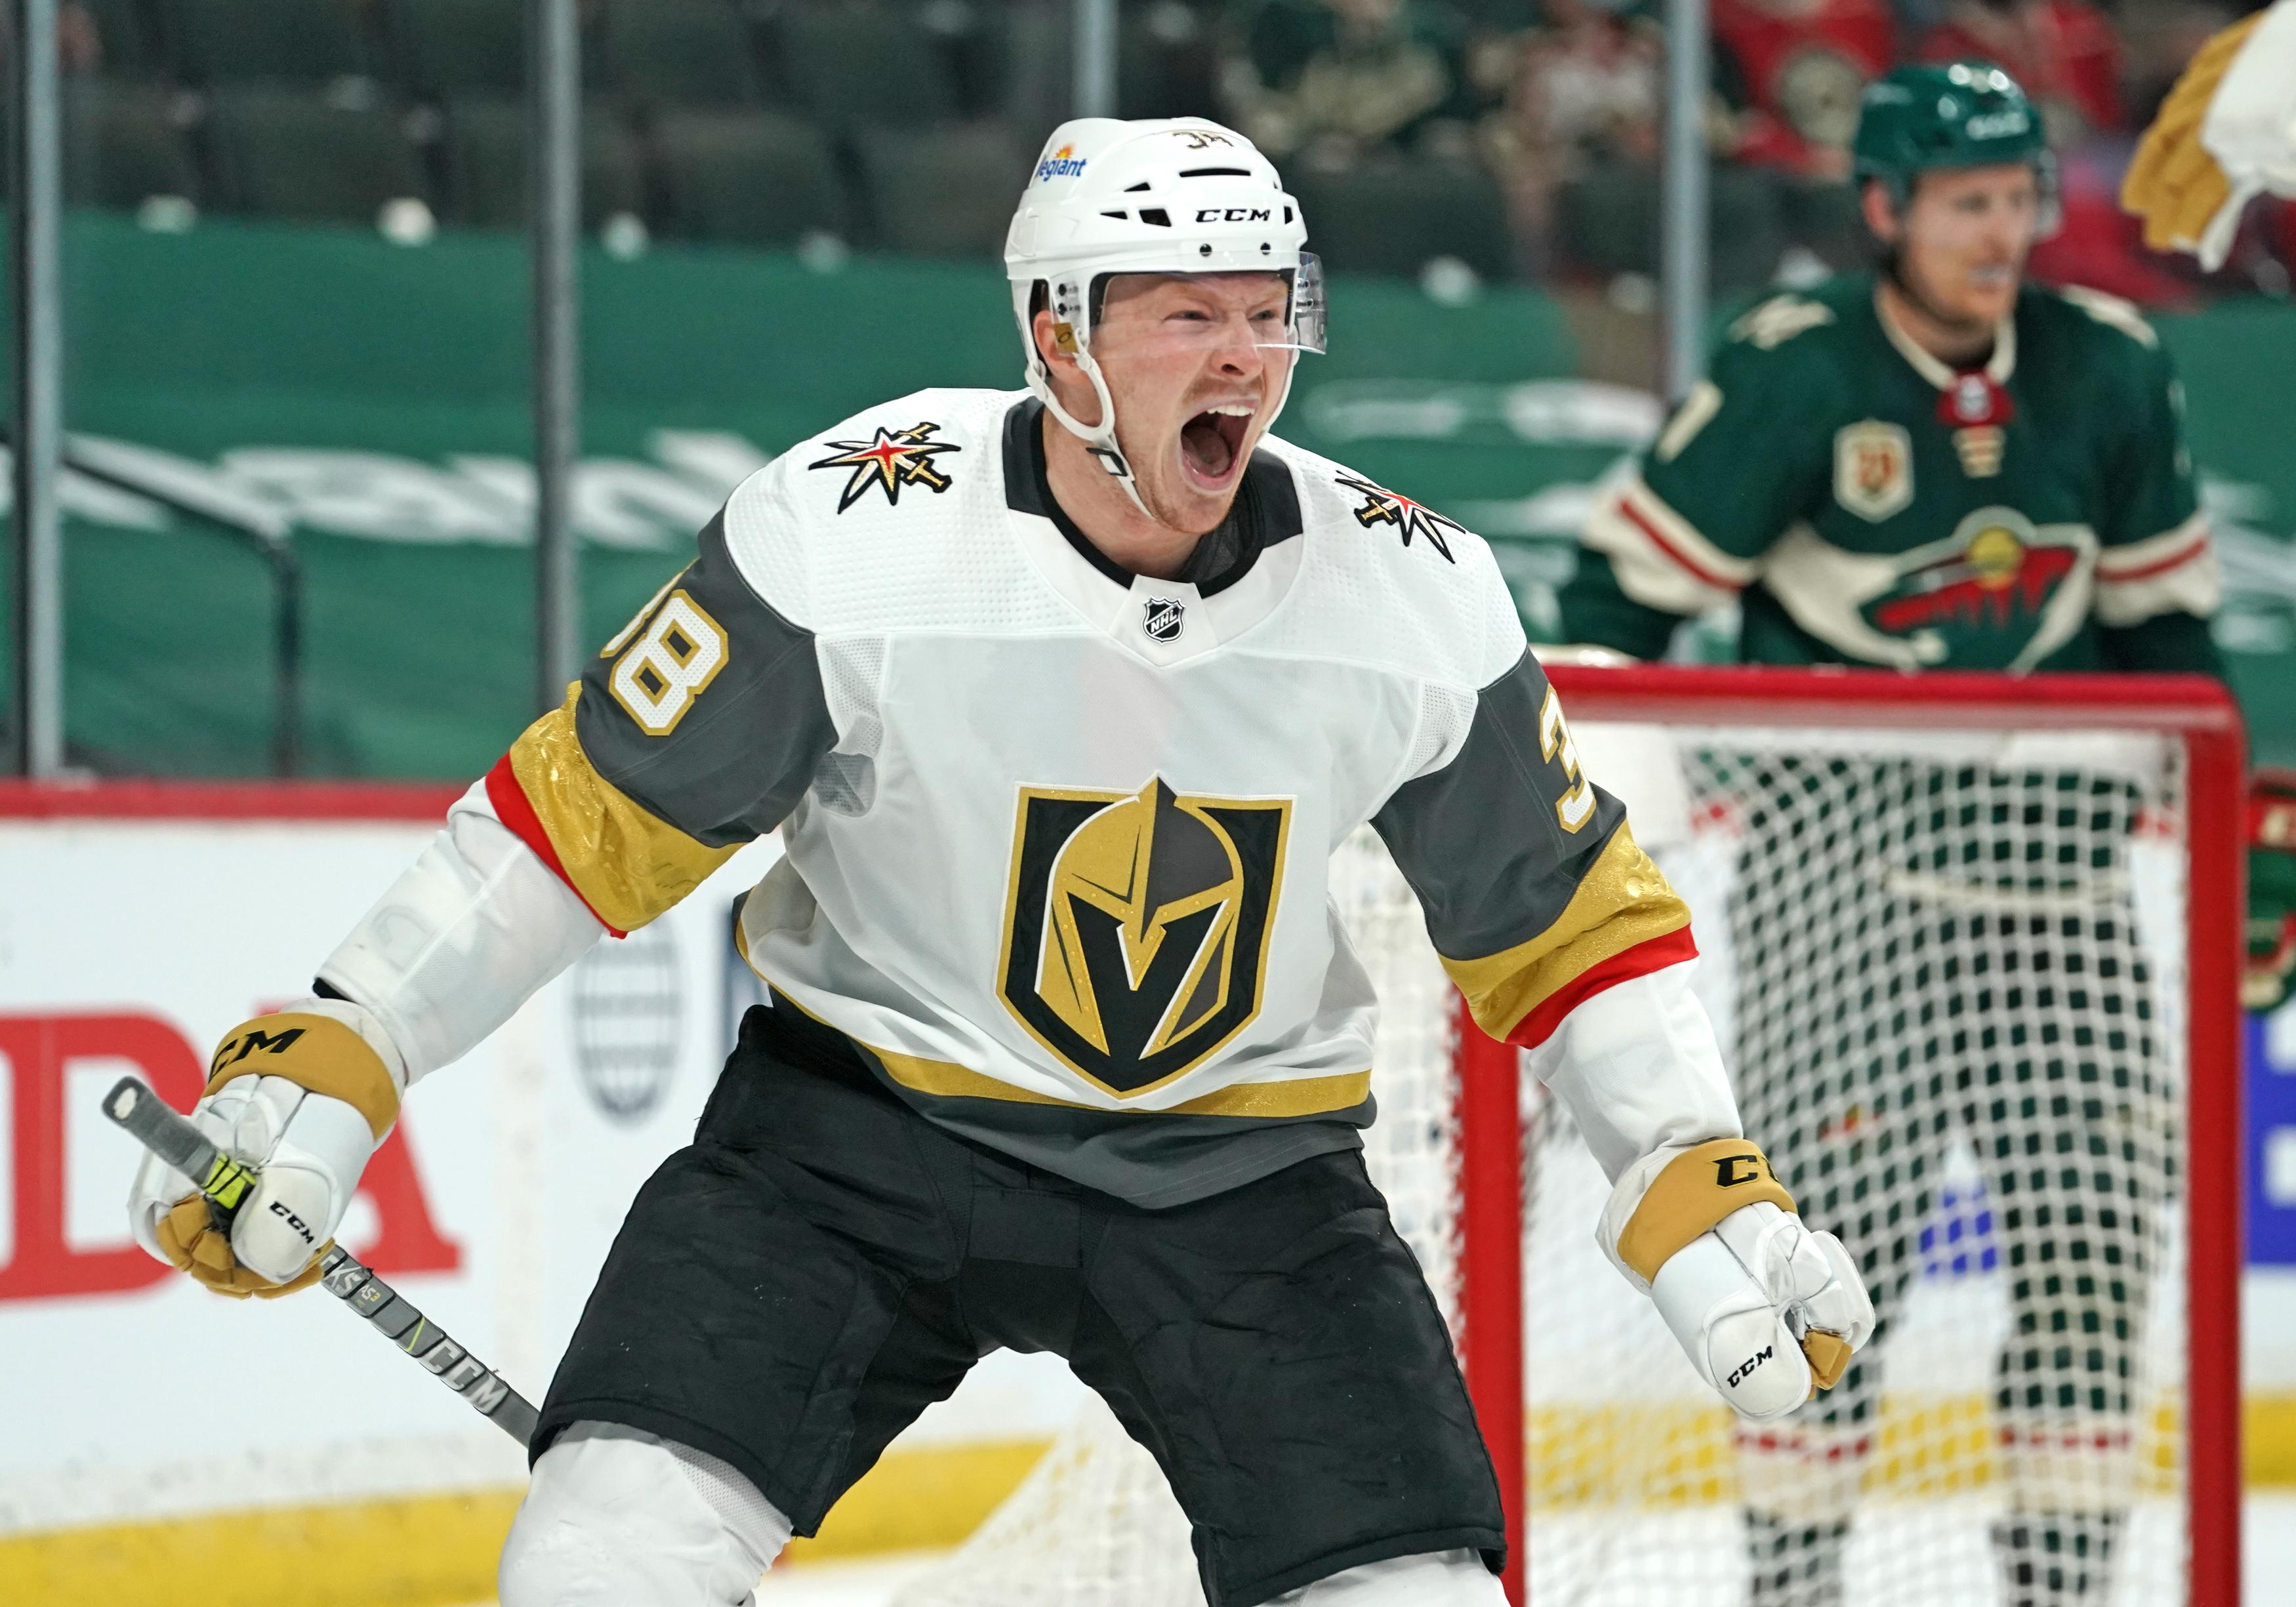 NHL: MAY 20 Stanley Cup Playoffs First Round - Golden Knights at Wild